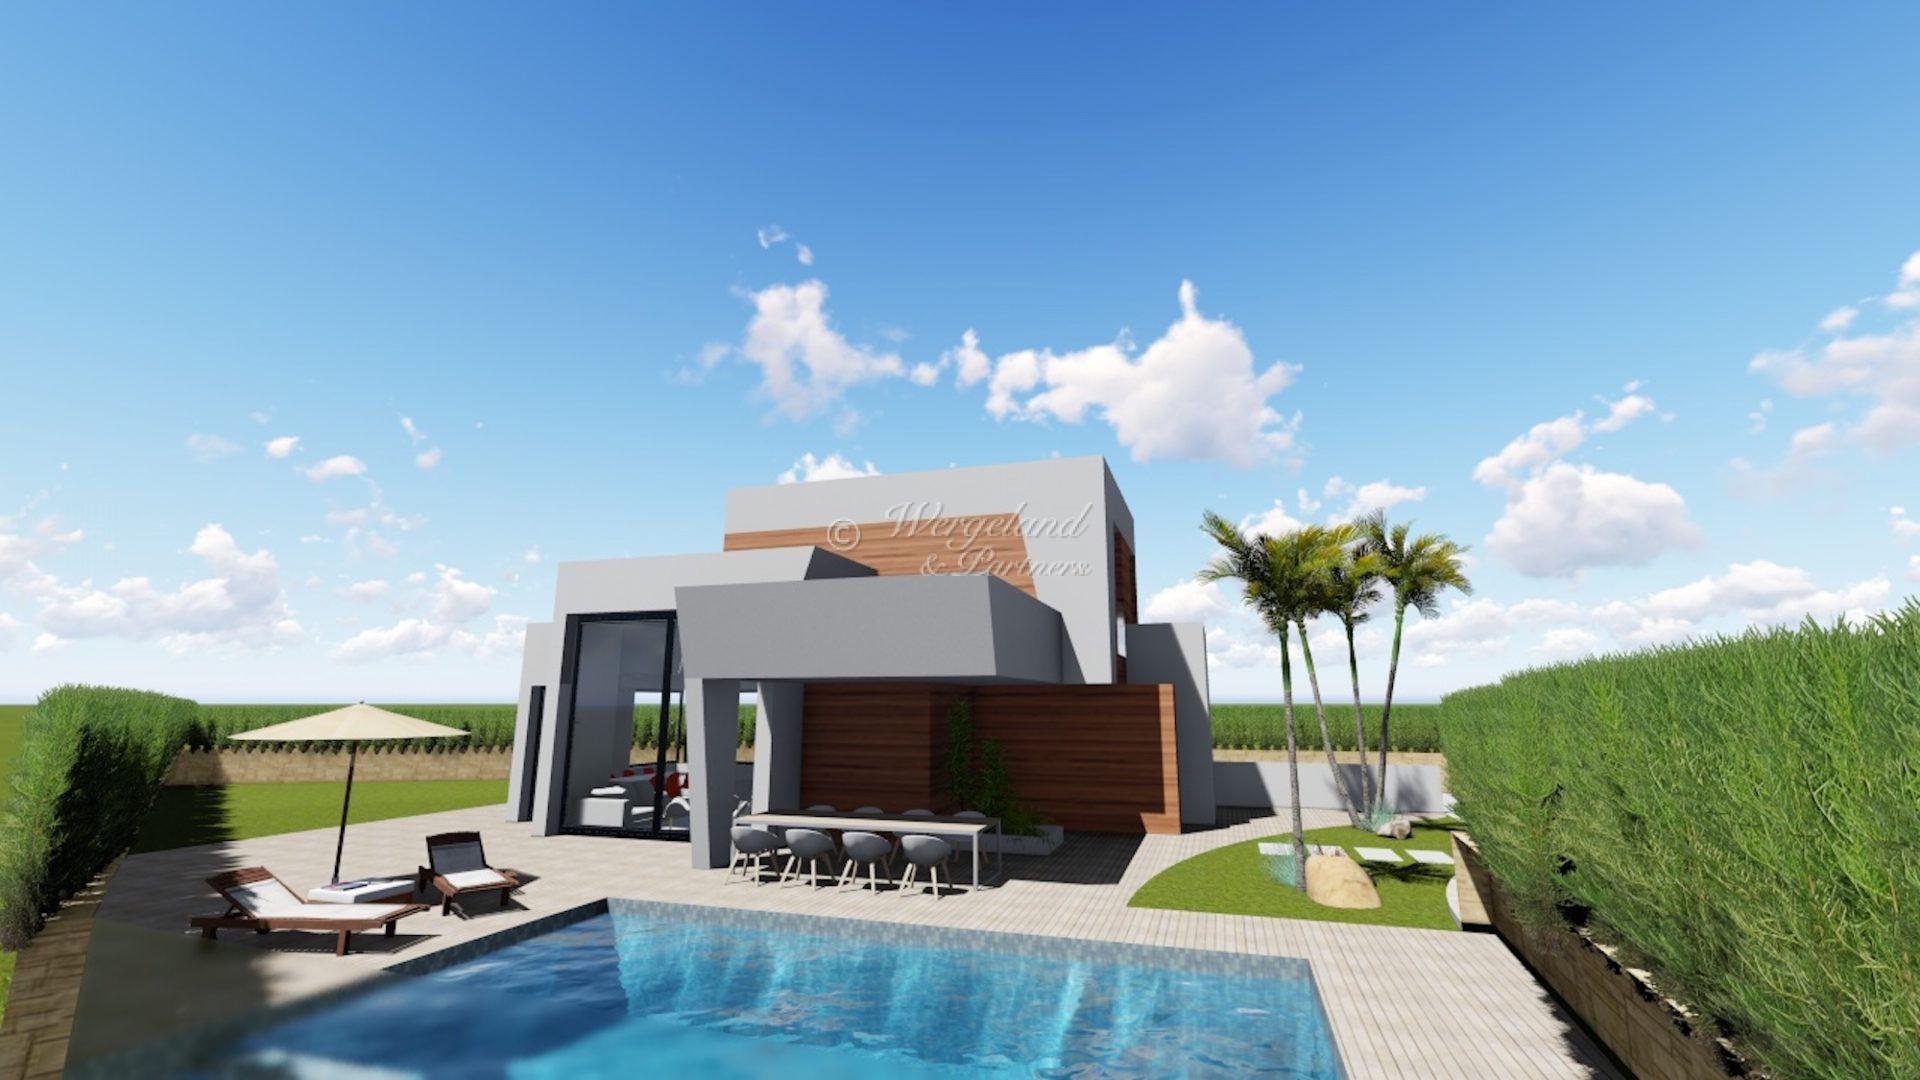 4 soveroms villa med takterrasse og basseng etter dine ønsker [LMCB6]